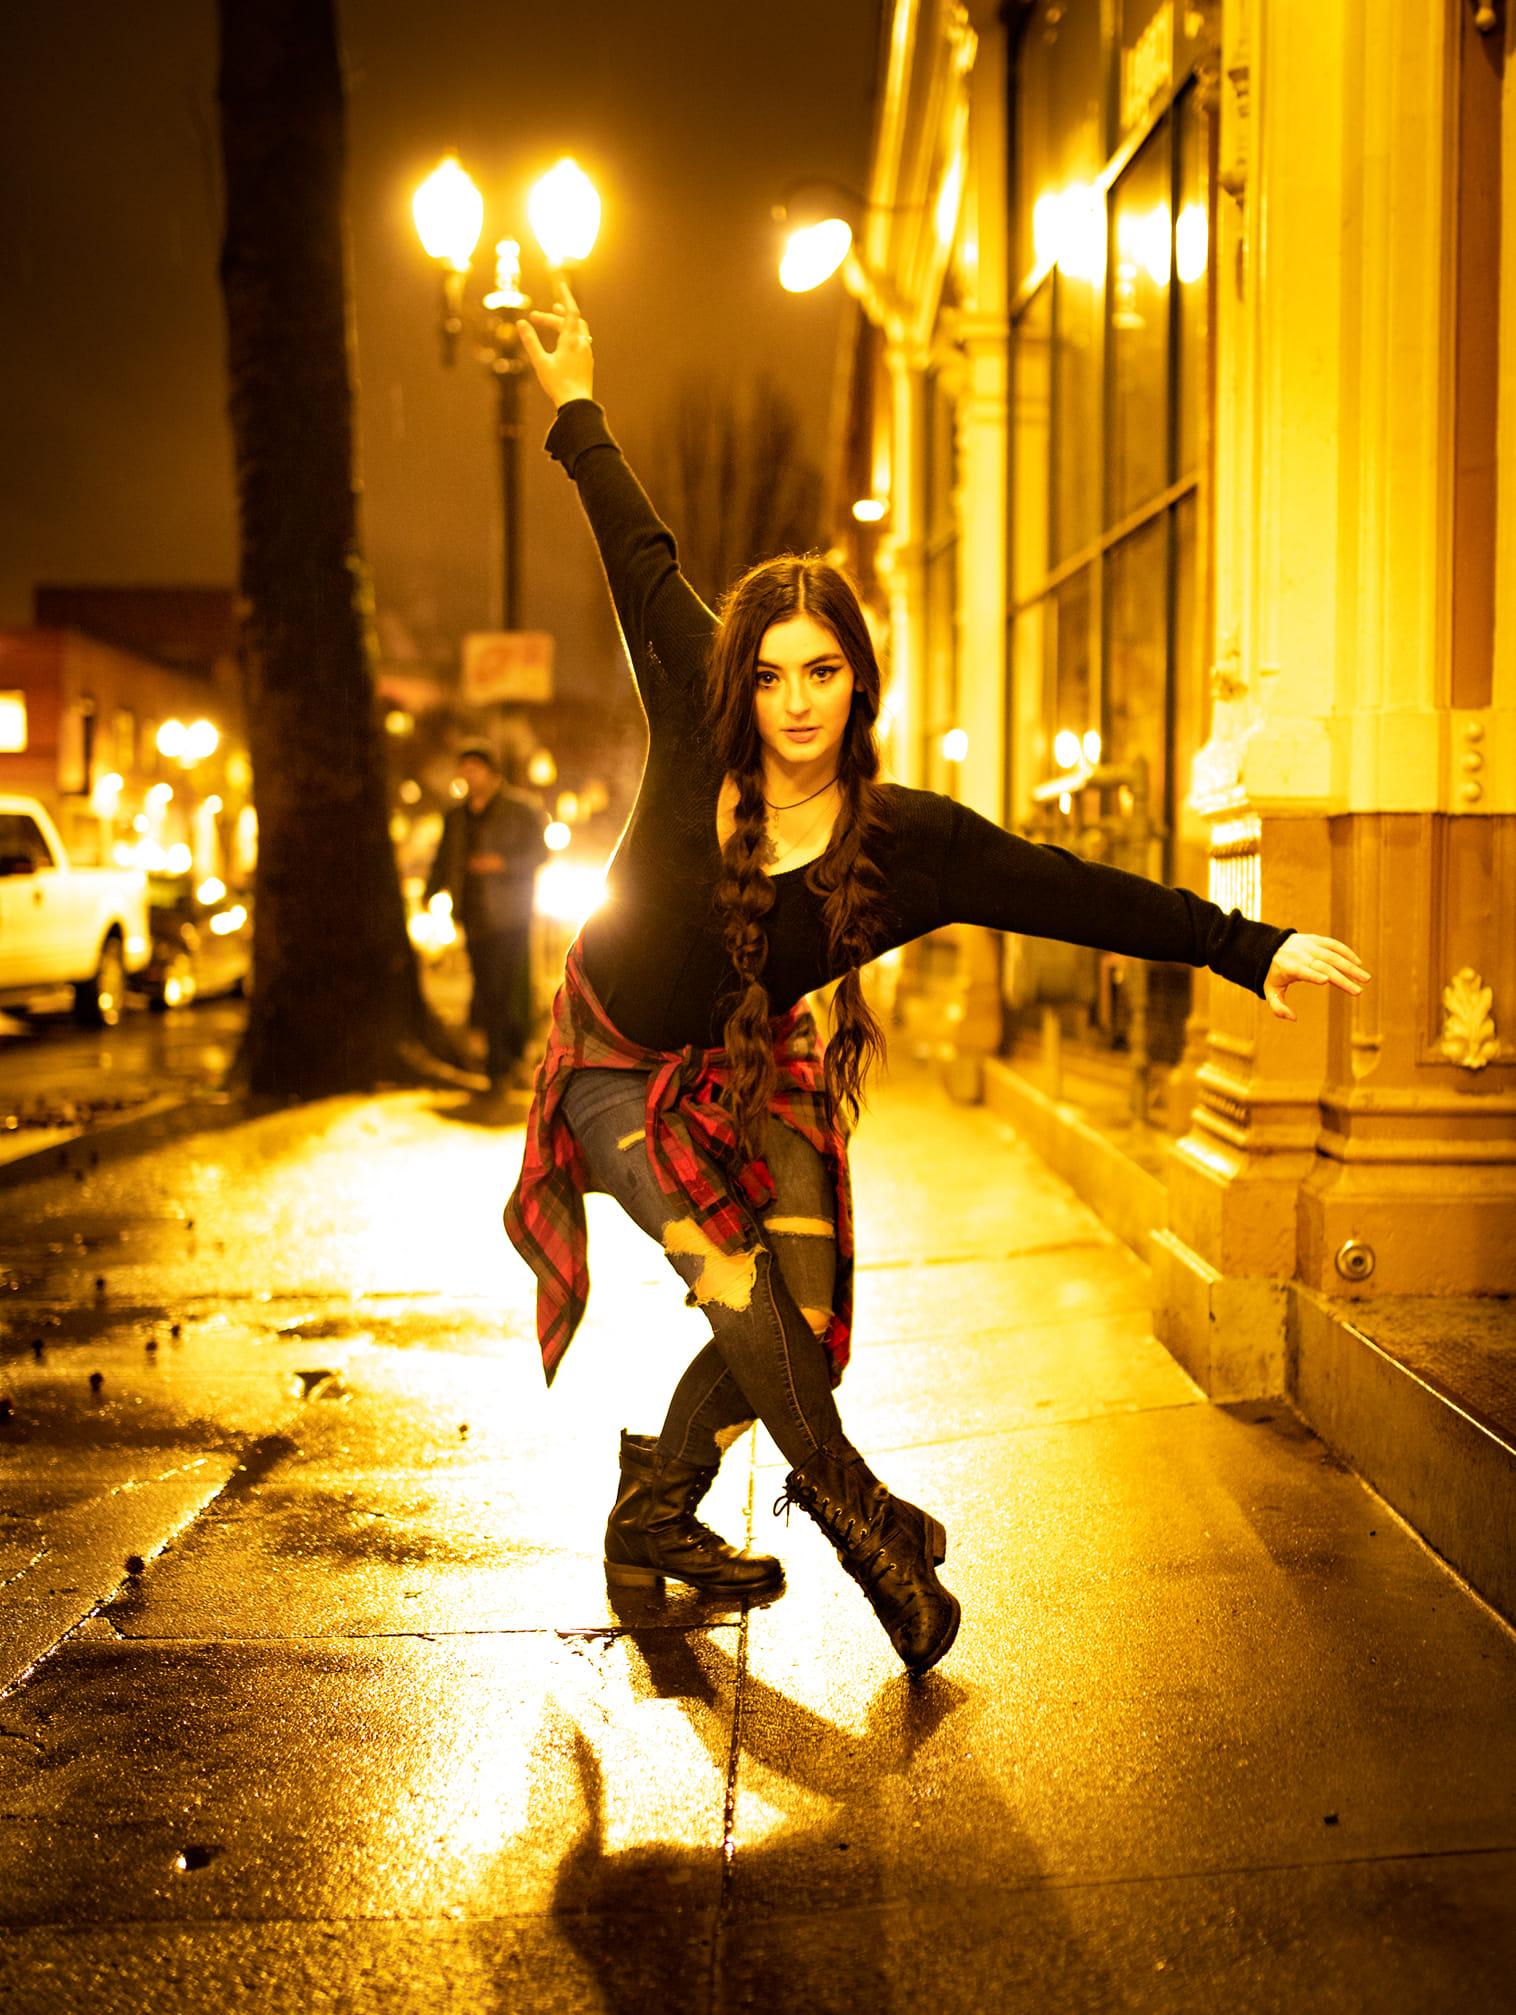 Tom_Lupton_Photography_Dancing.jpg